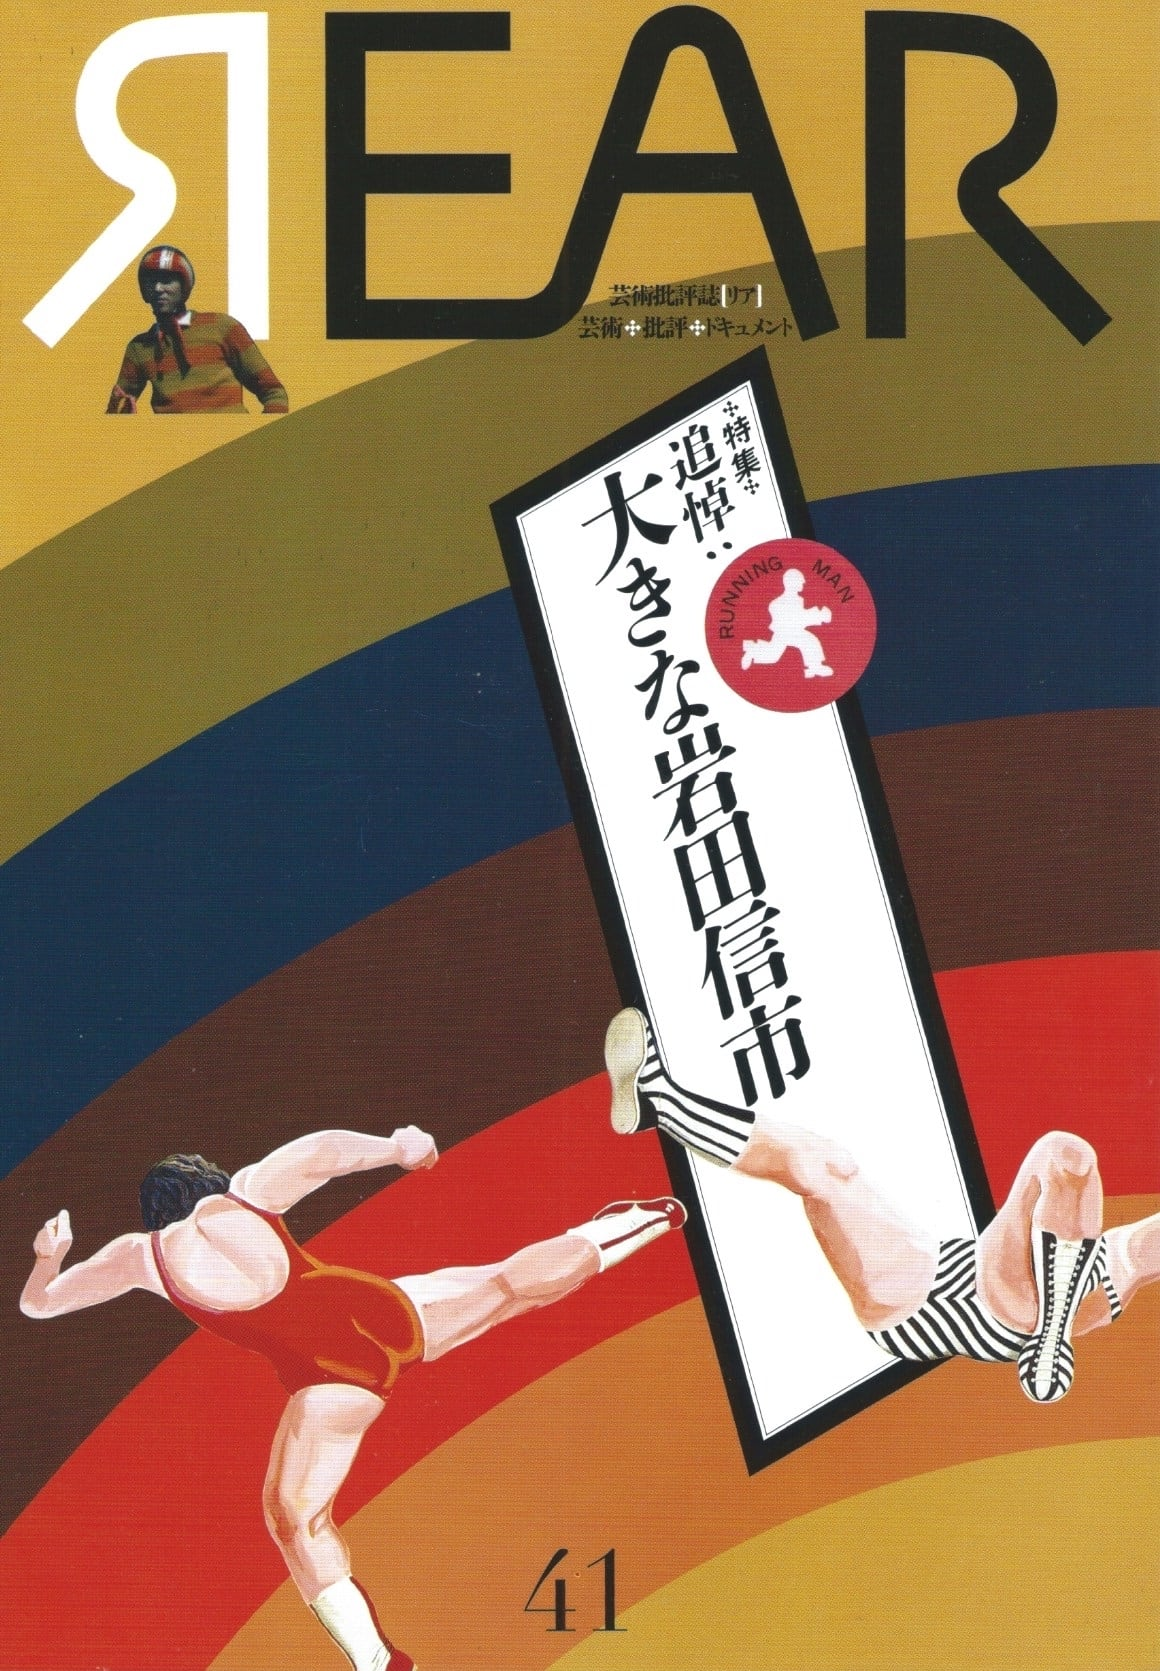 REAR no.41 追悼:大きな岩田信仰